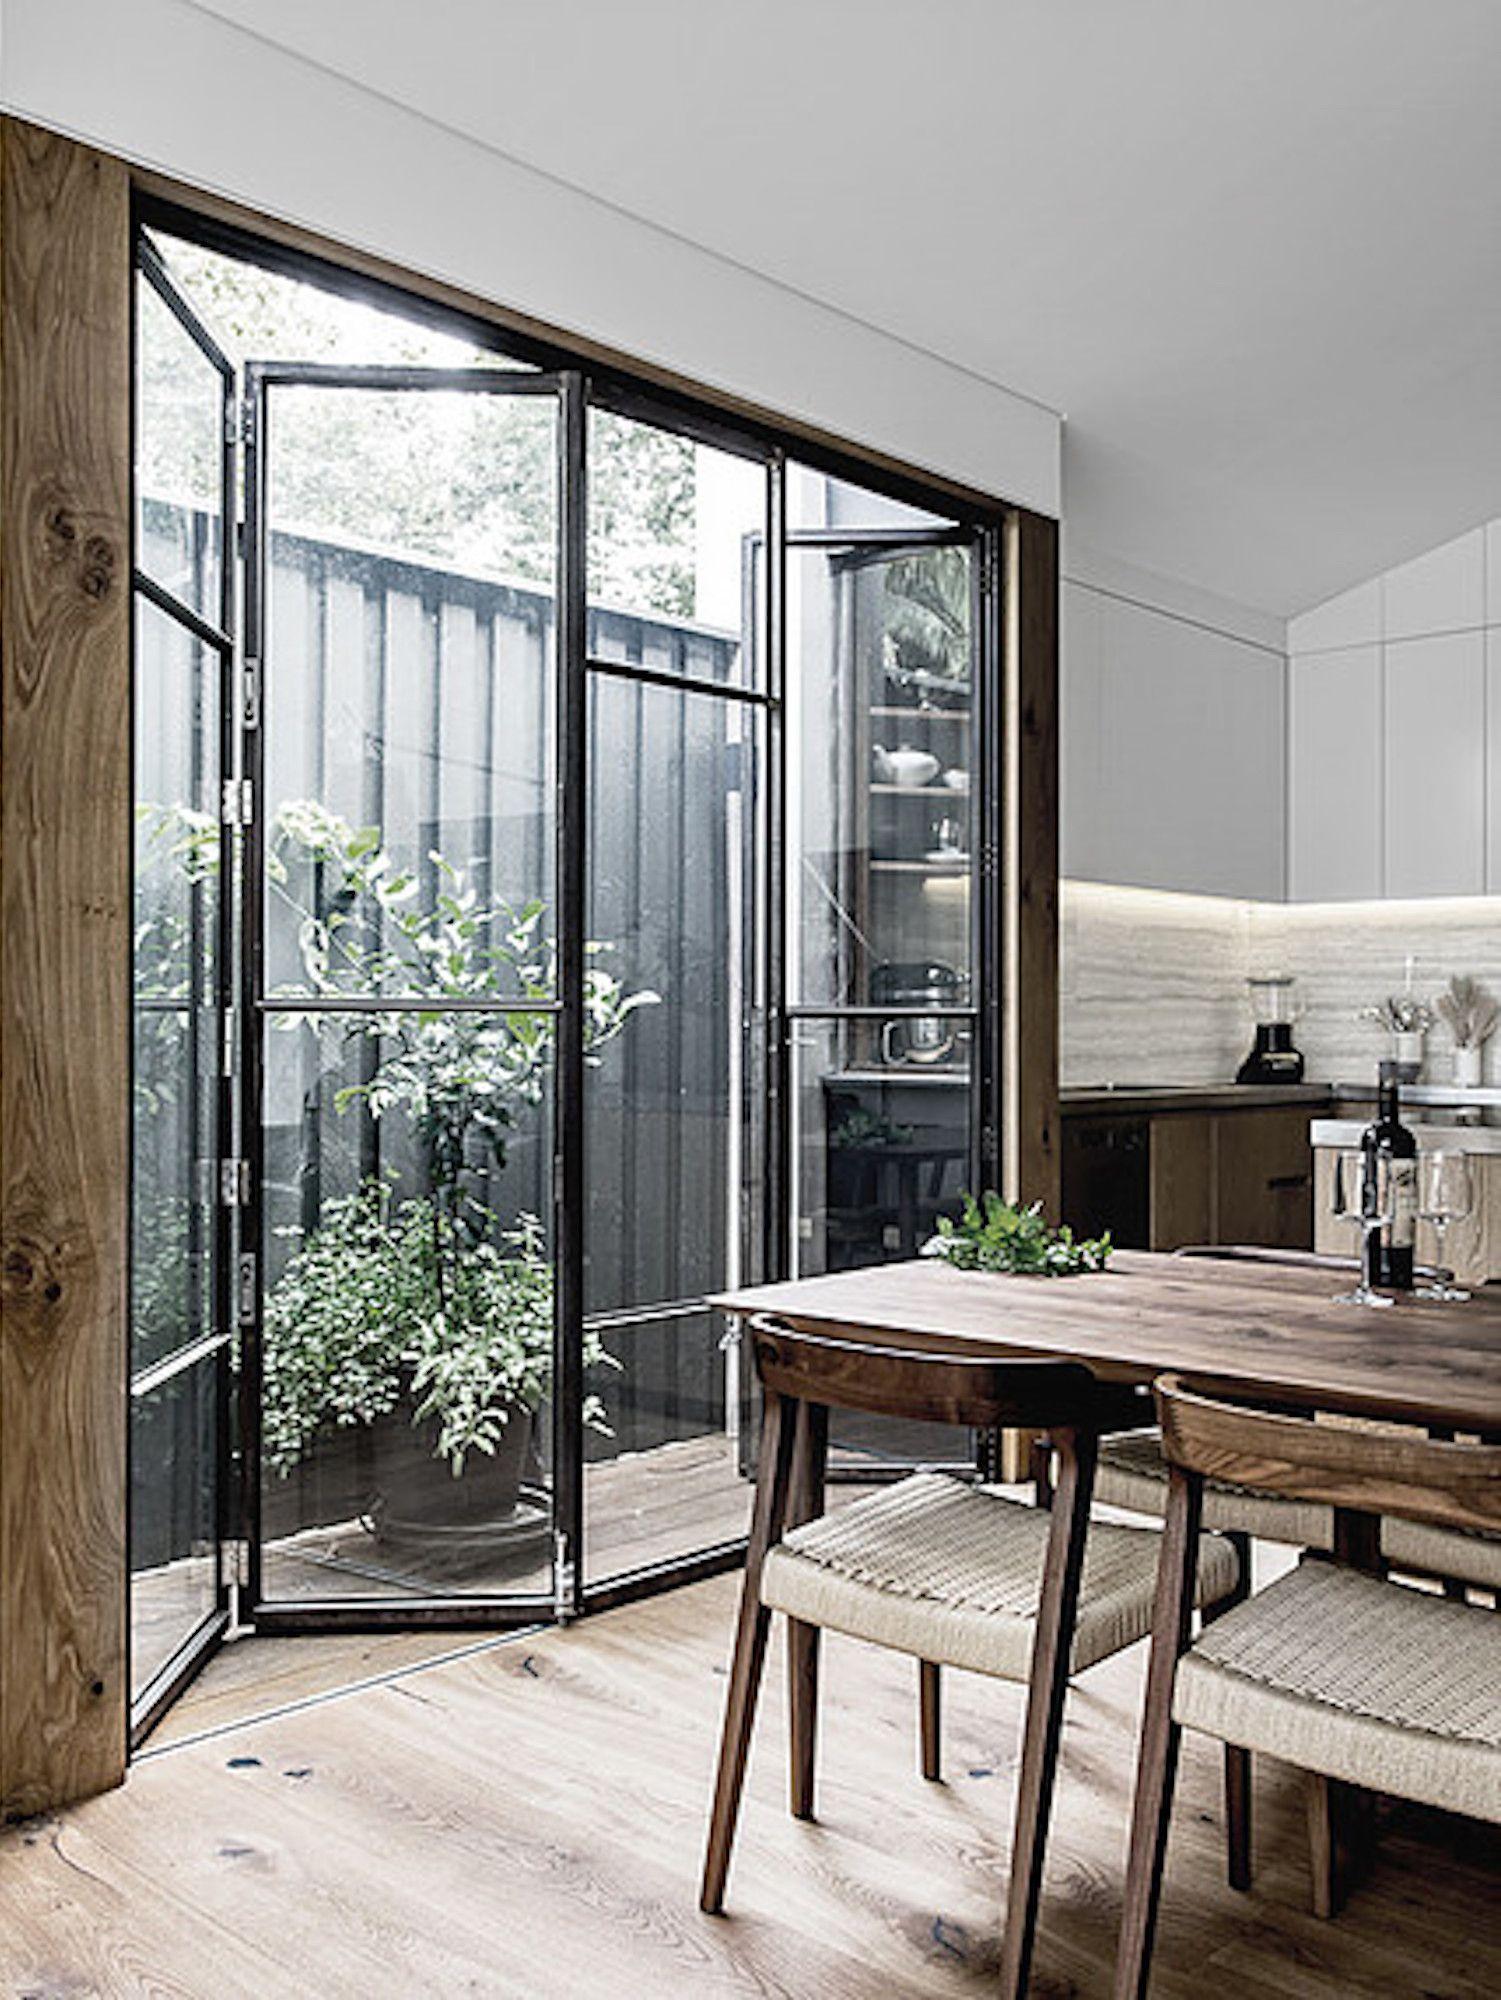 Adrian Amore Architects Paddington Terrace Est Living - Design home decor